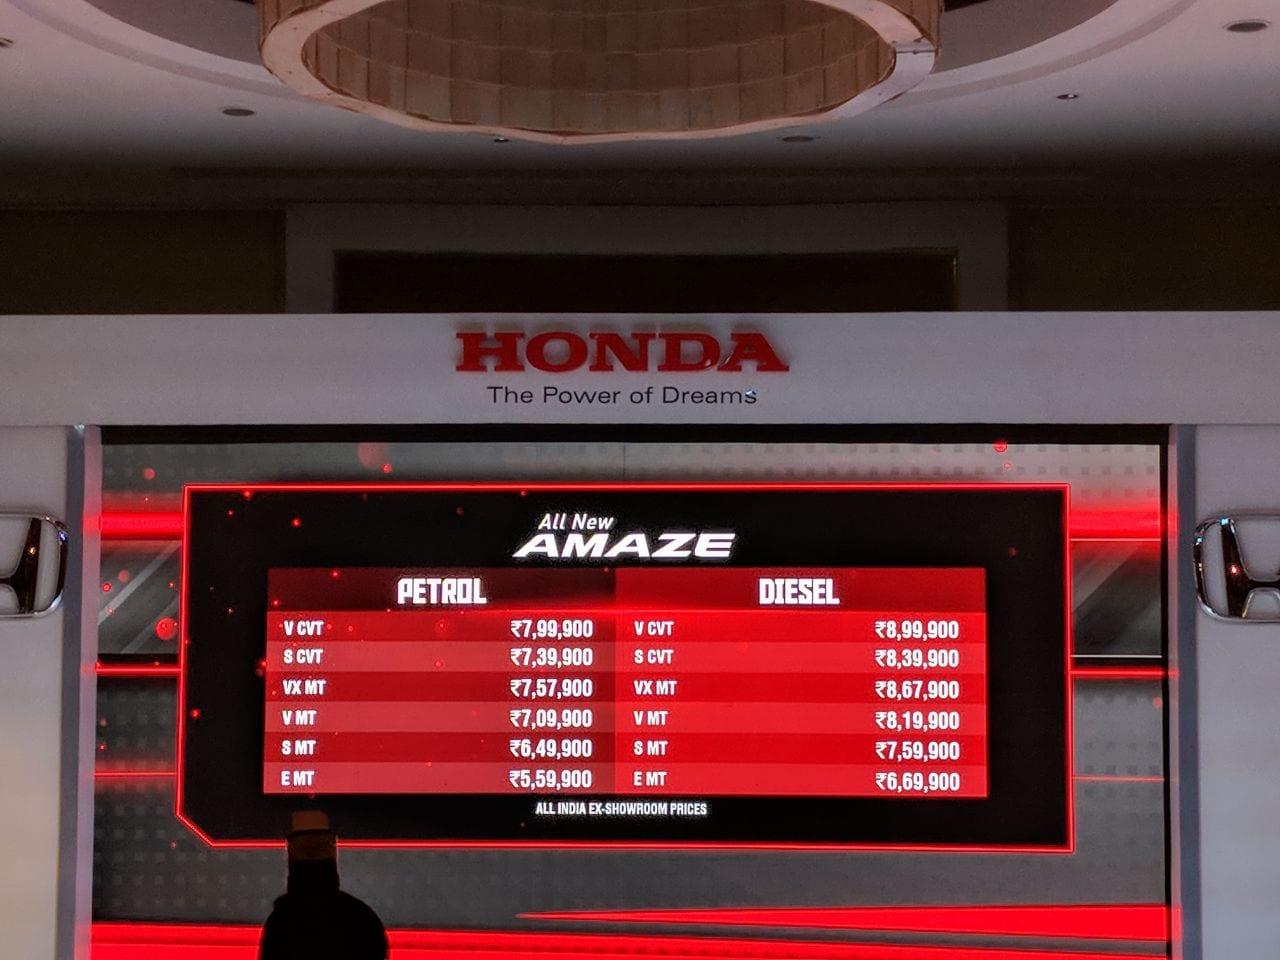 Hyundai Xcent vs 2018 Honda Amaze: Specifications compared